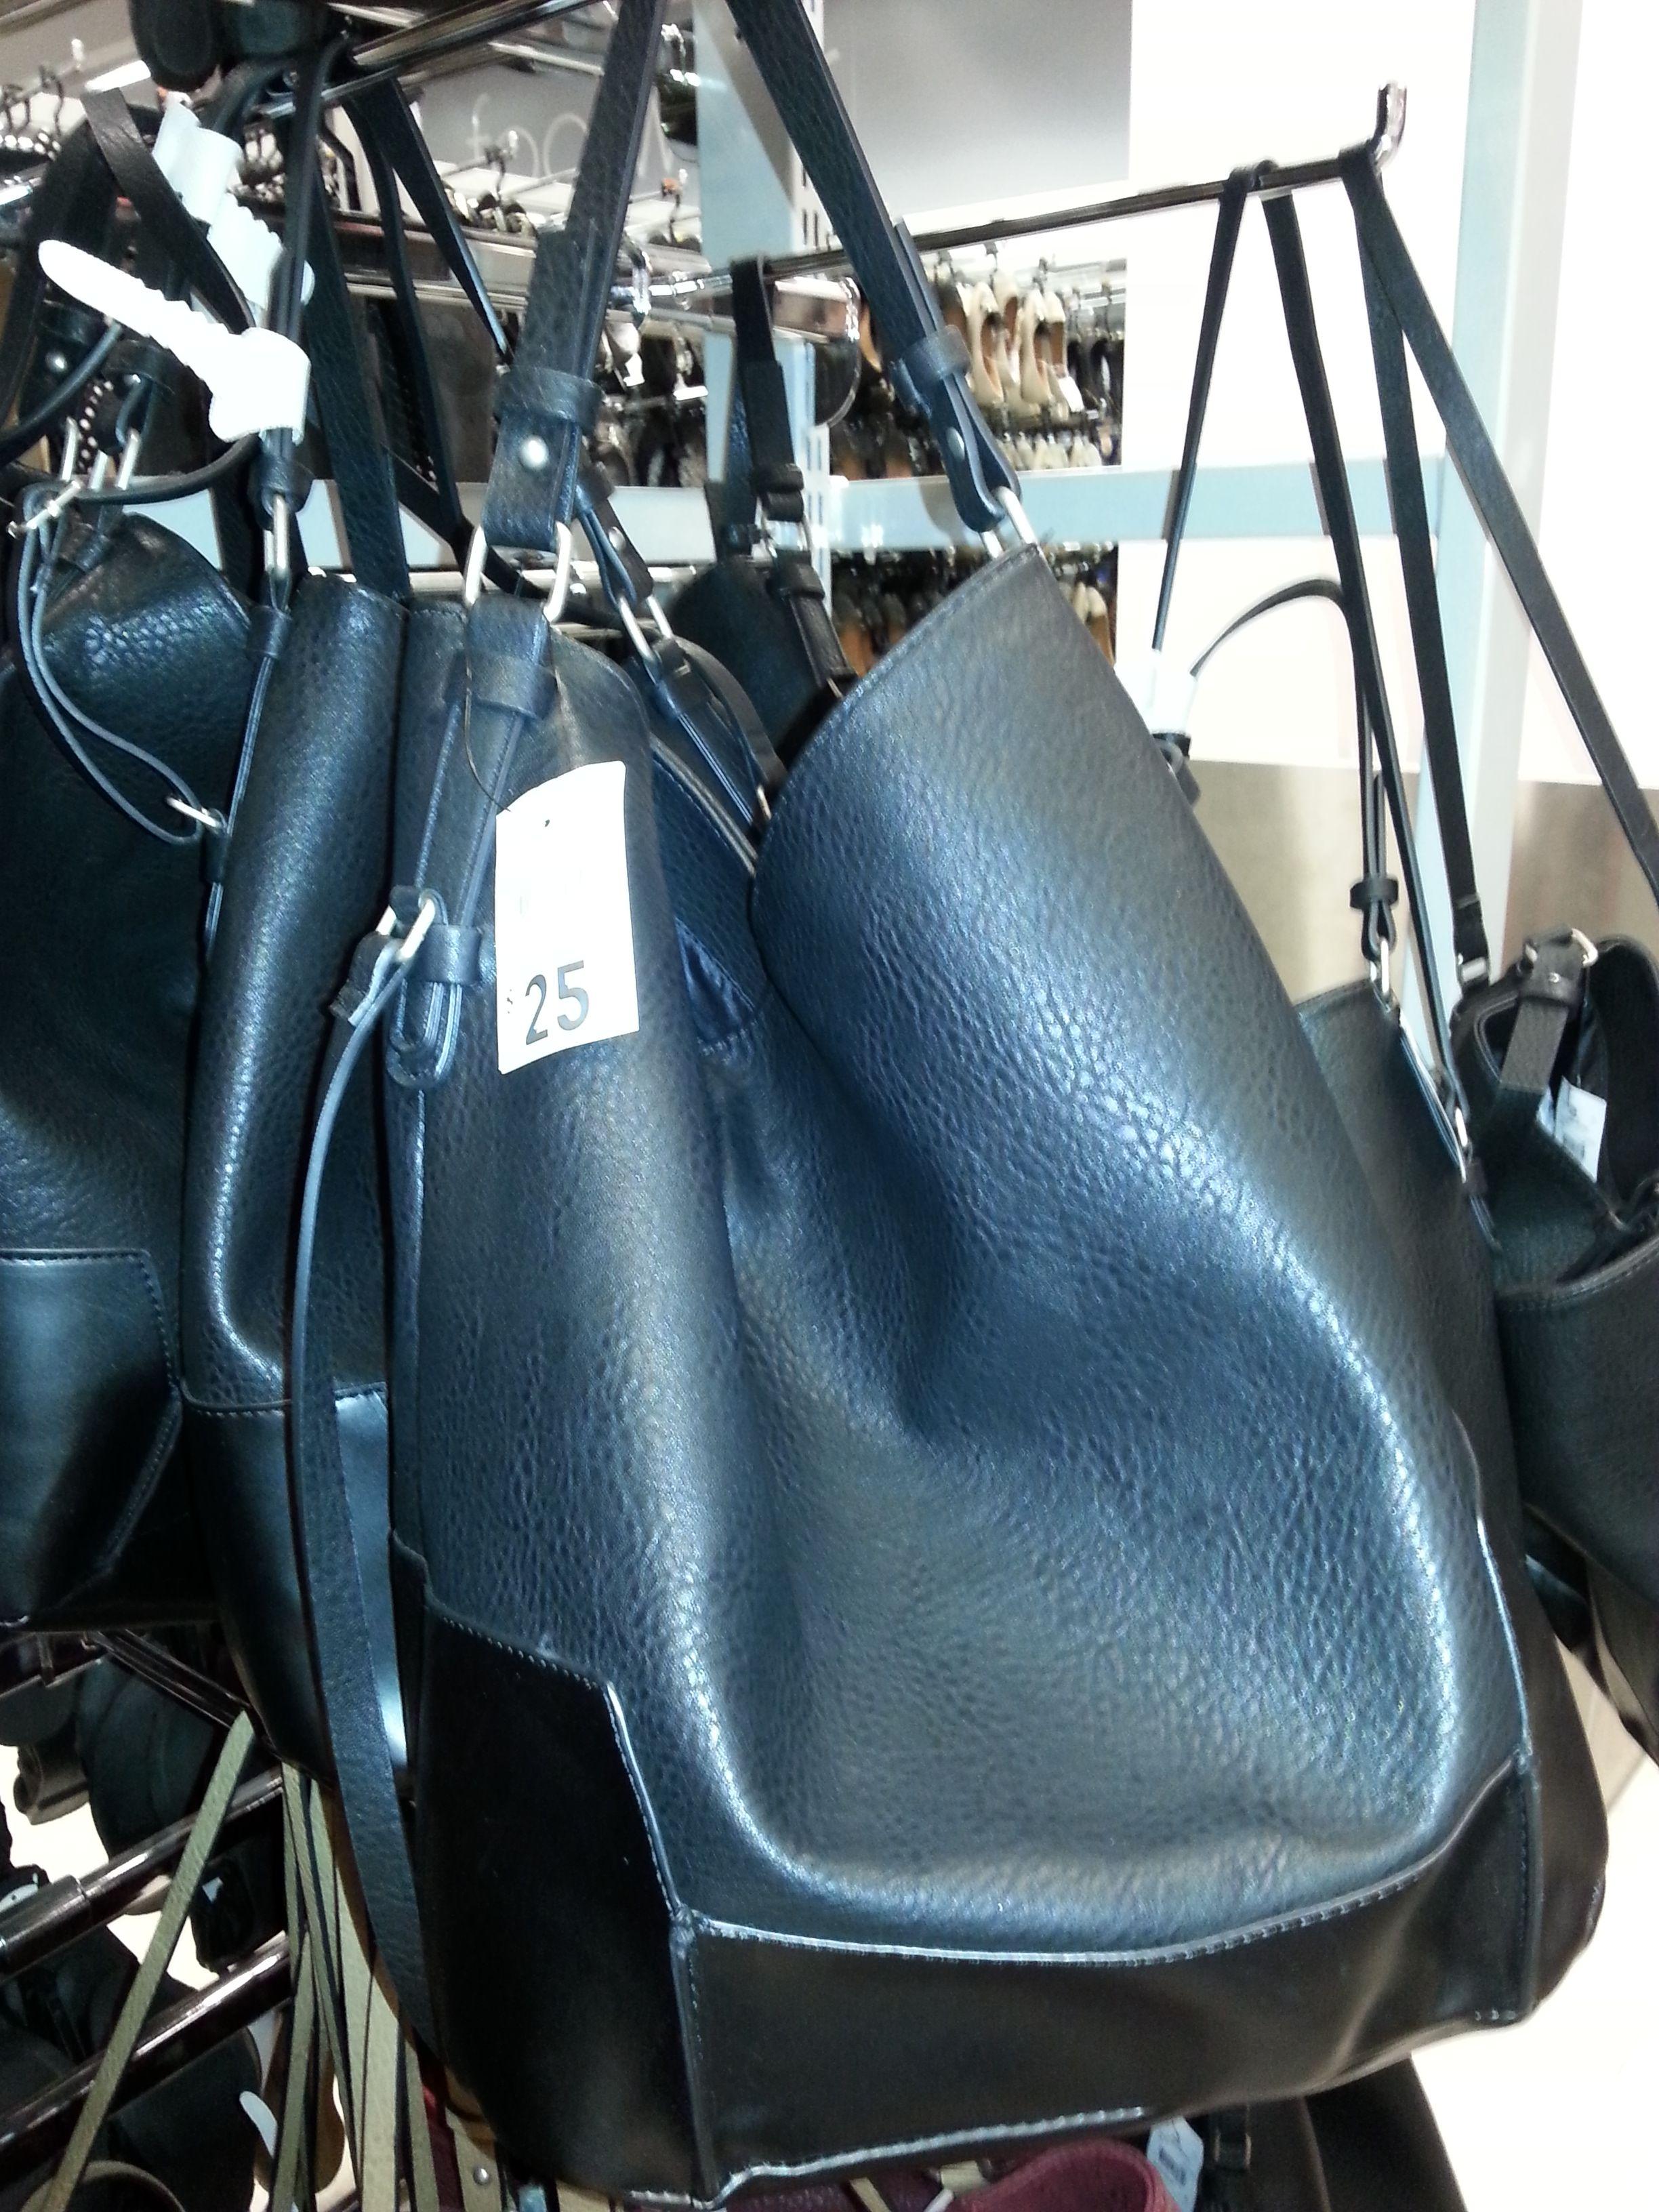 b9797f9a7af0 Duffle Bag With Wheels Kmart